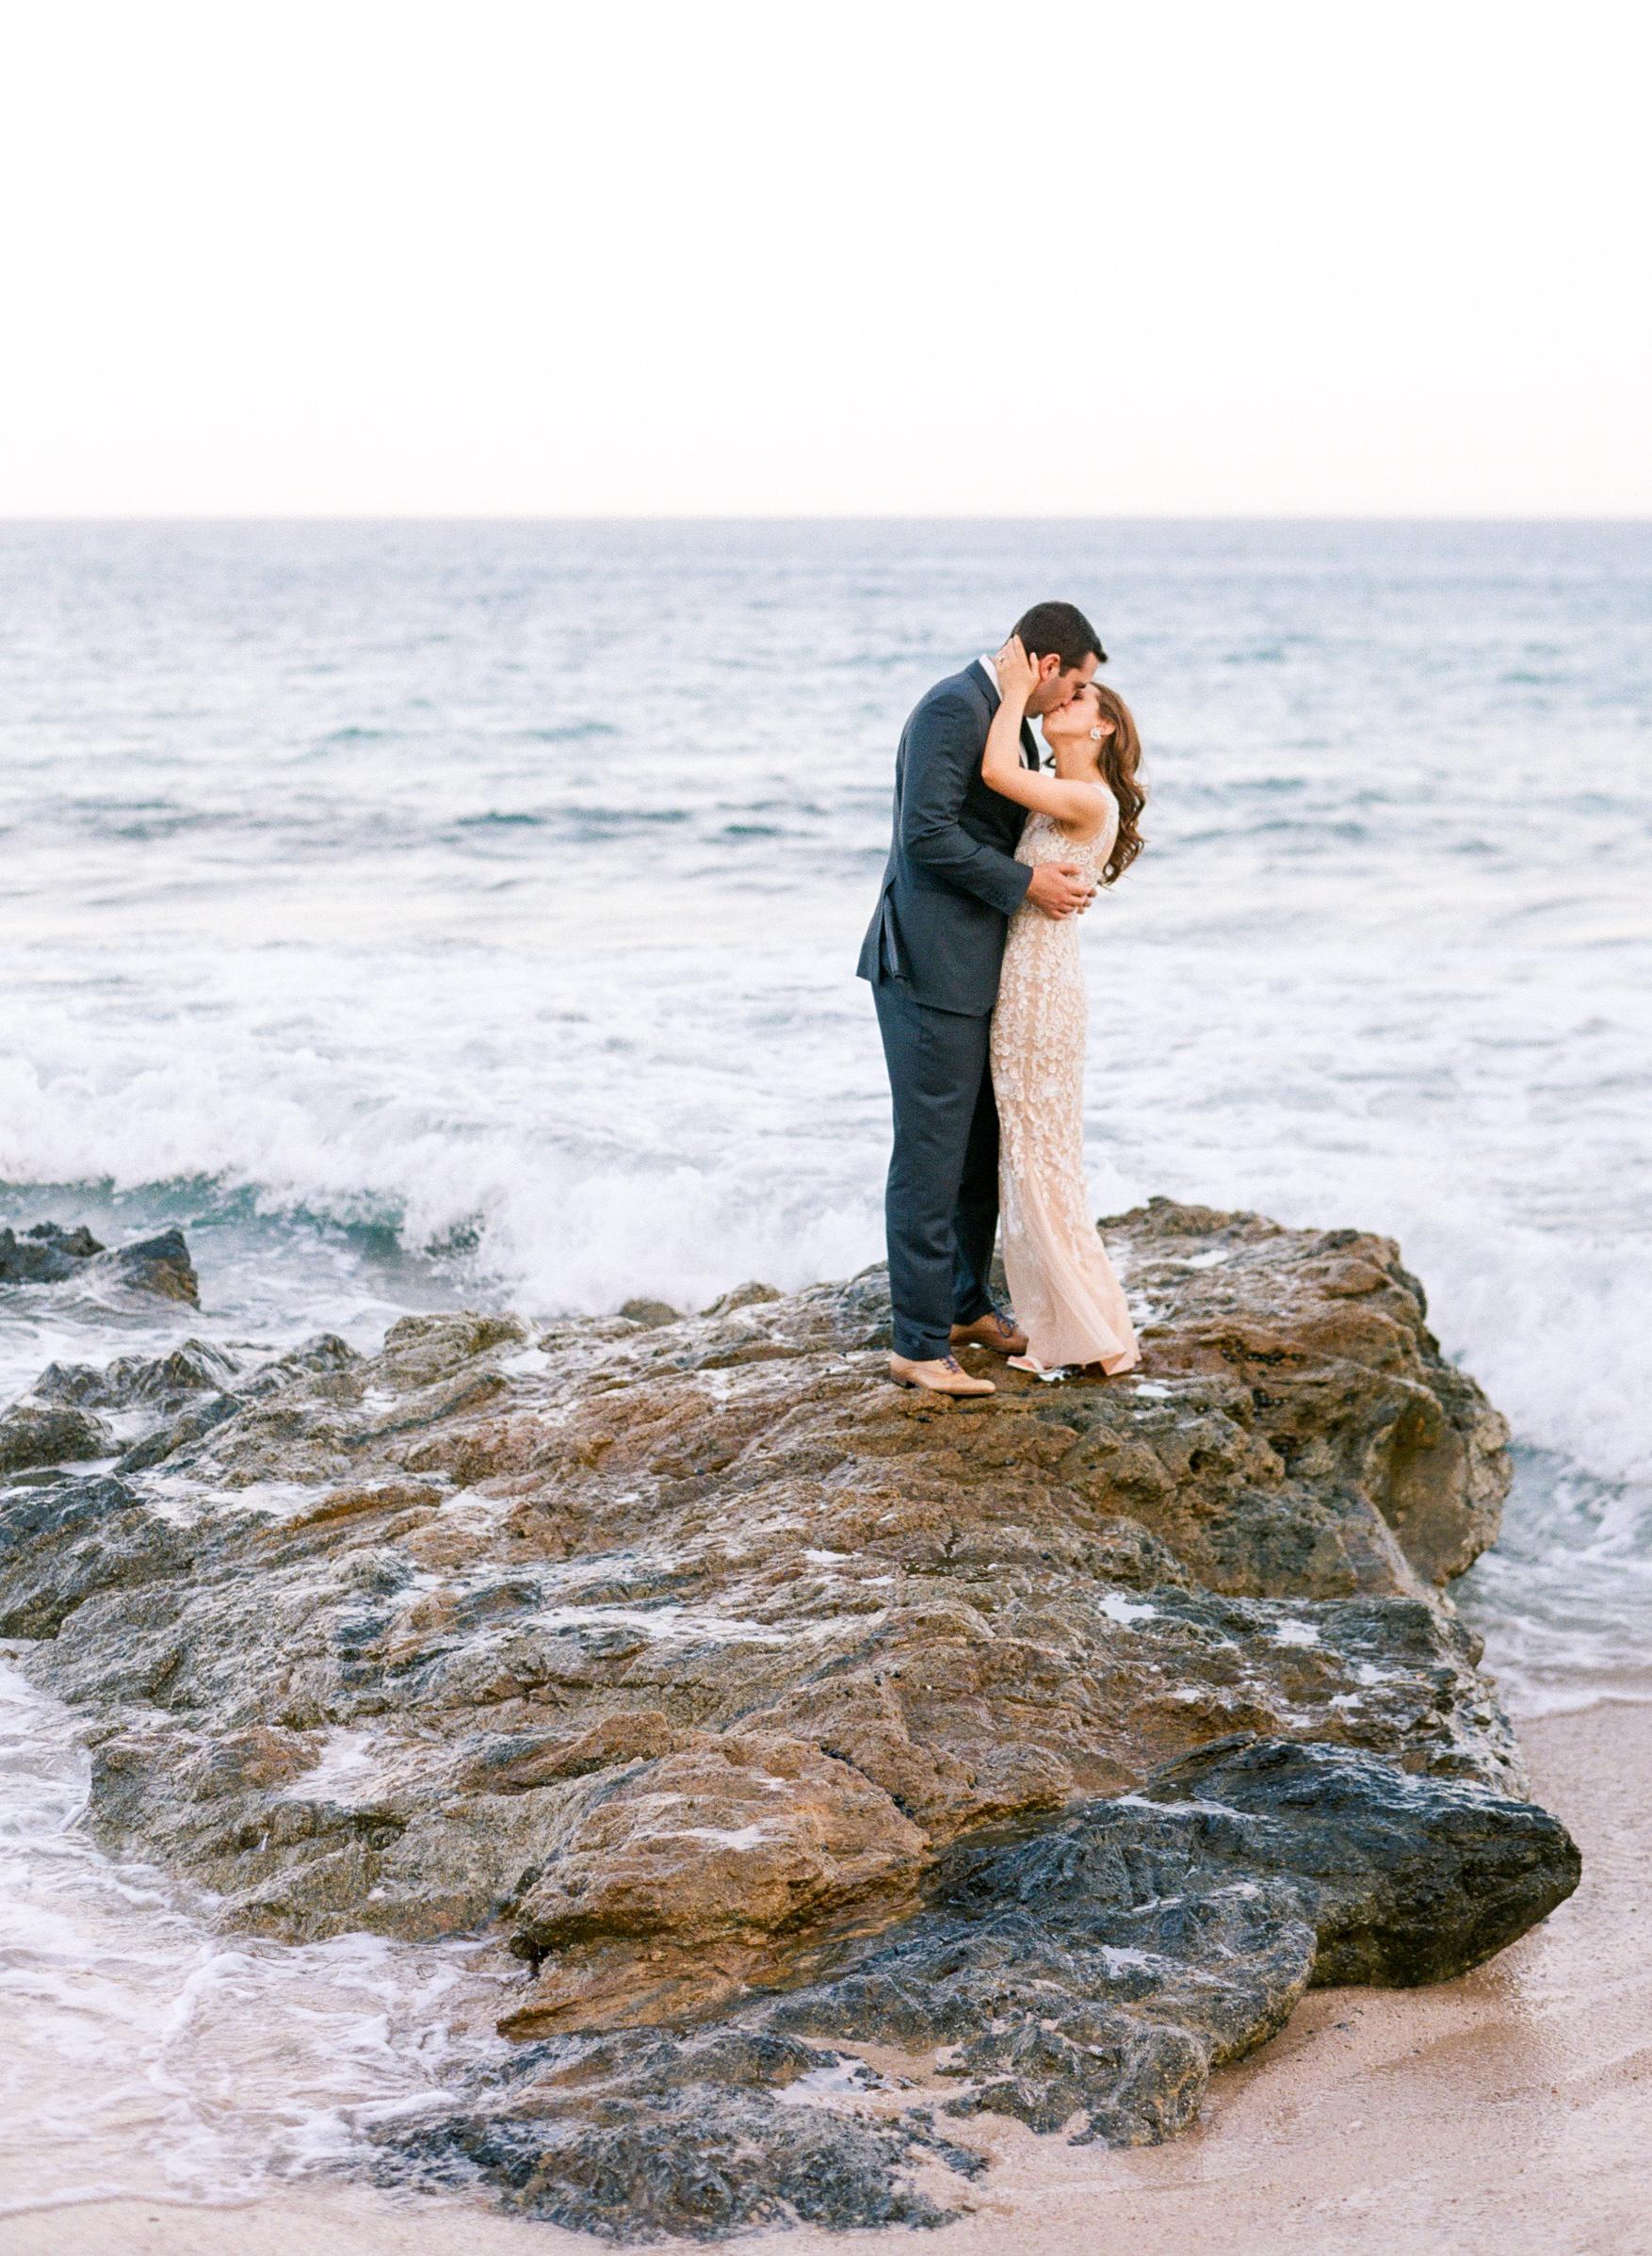 Dana-Fernandez-Photography-Destination-Wedding-Photographer-Cabo-San-Lucas-Film-Houston-Texas-Cabo-15.jpg